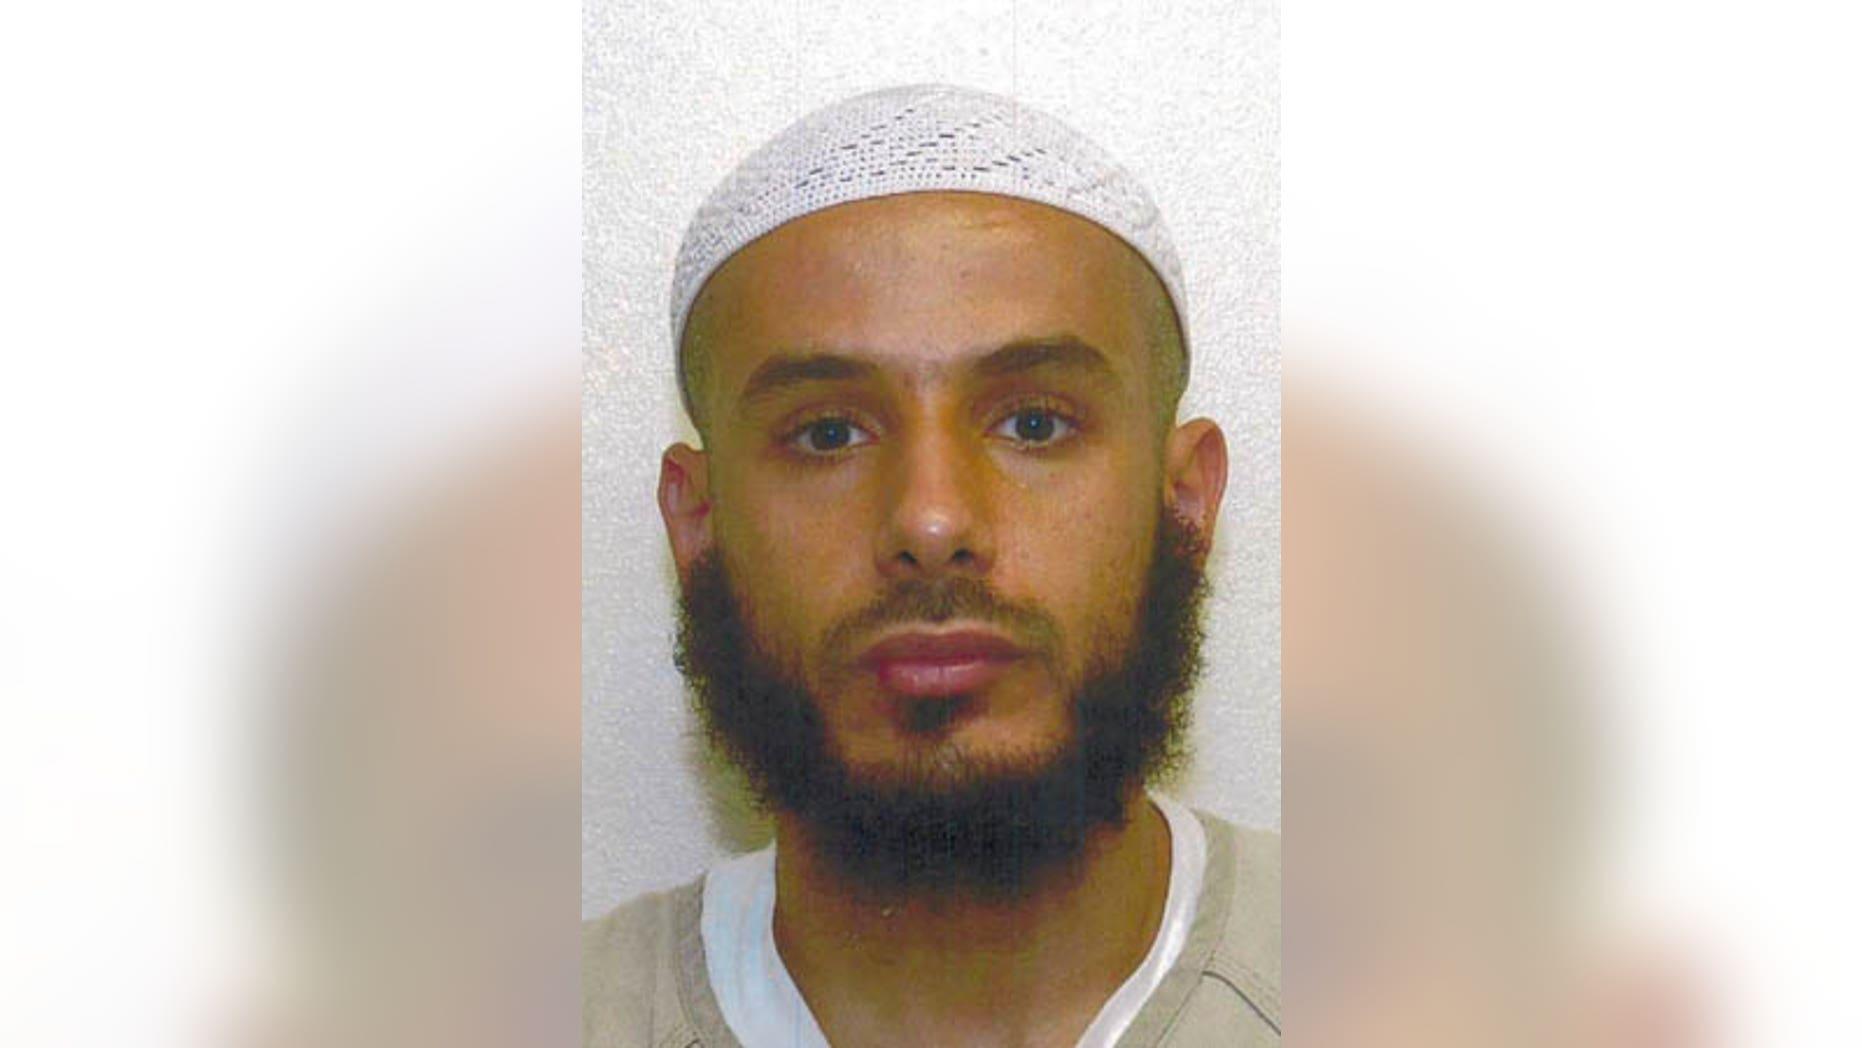 This Sept. 17, 2007 photo shows detainee Fouzi Khalid Abdullah al-Awda at Guantanamo Bay.